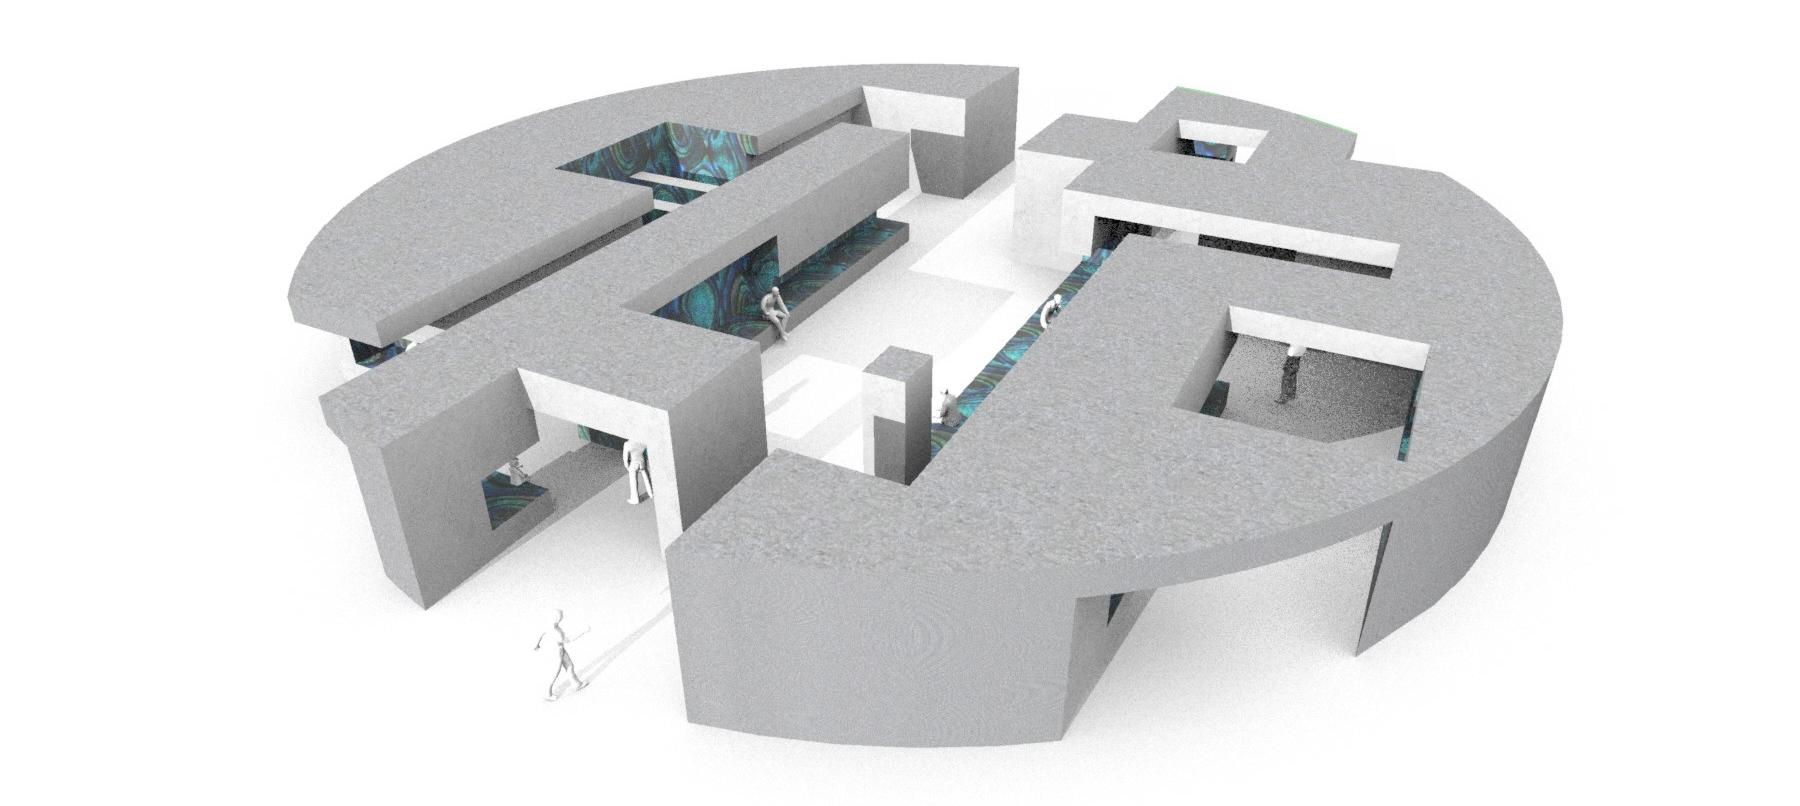 computer rendering of student pavilion design